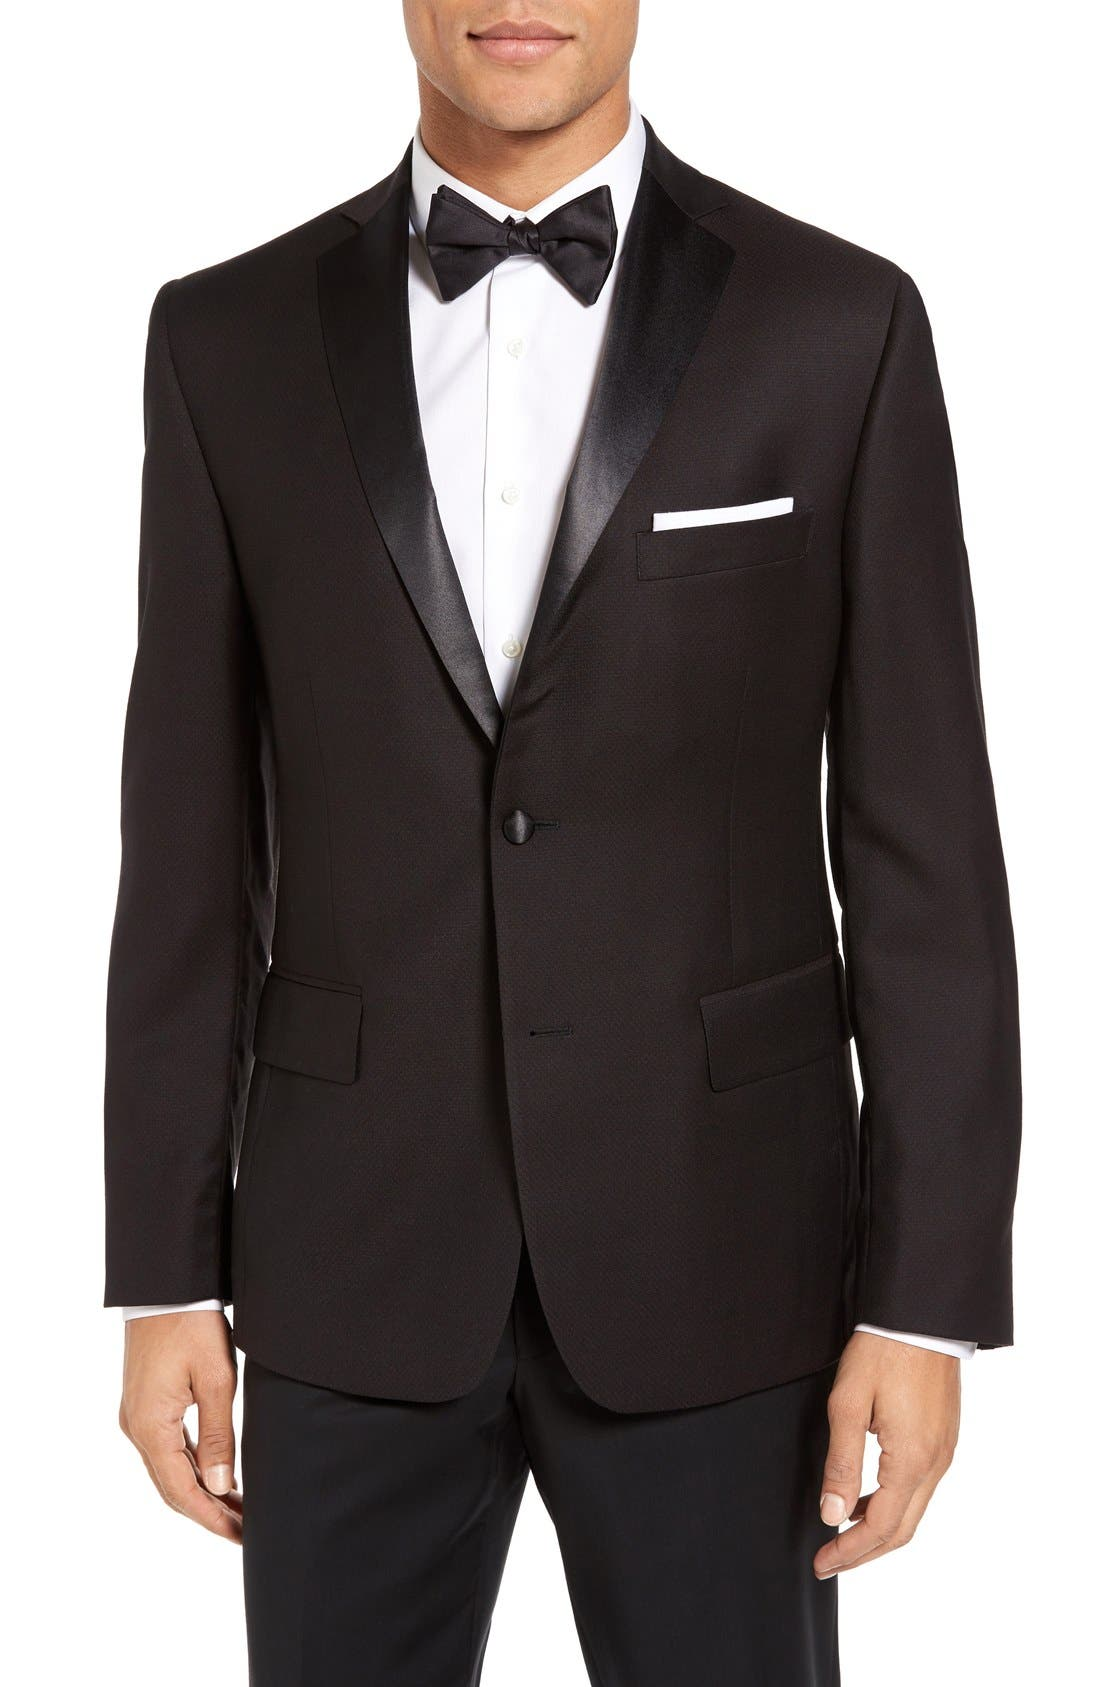 JB BRITCHES Classic Fit Wool Dinner Jacket